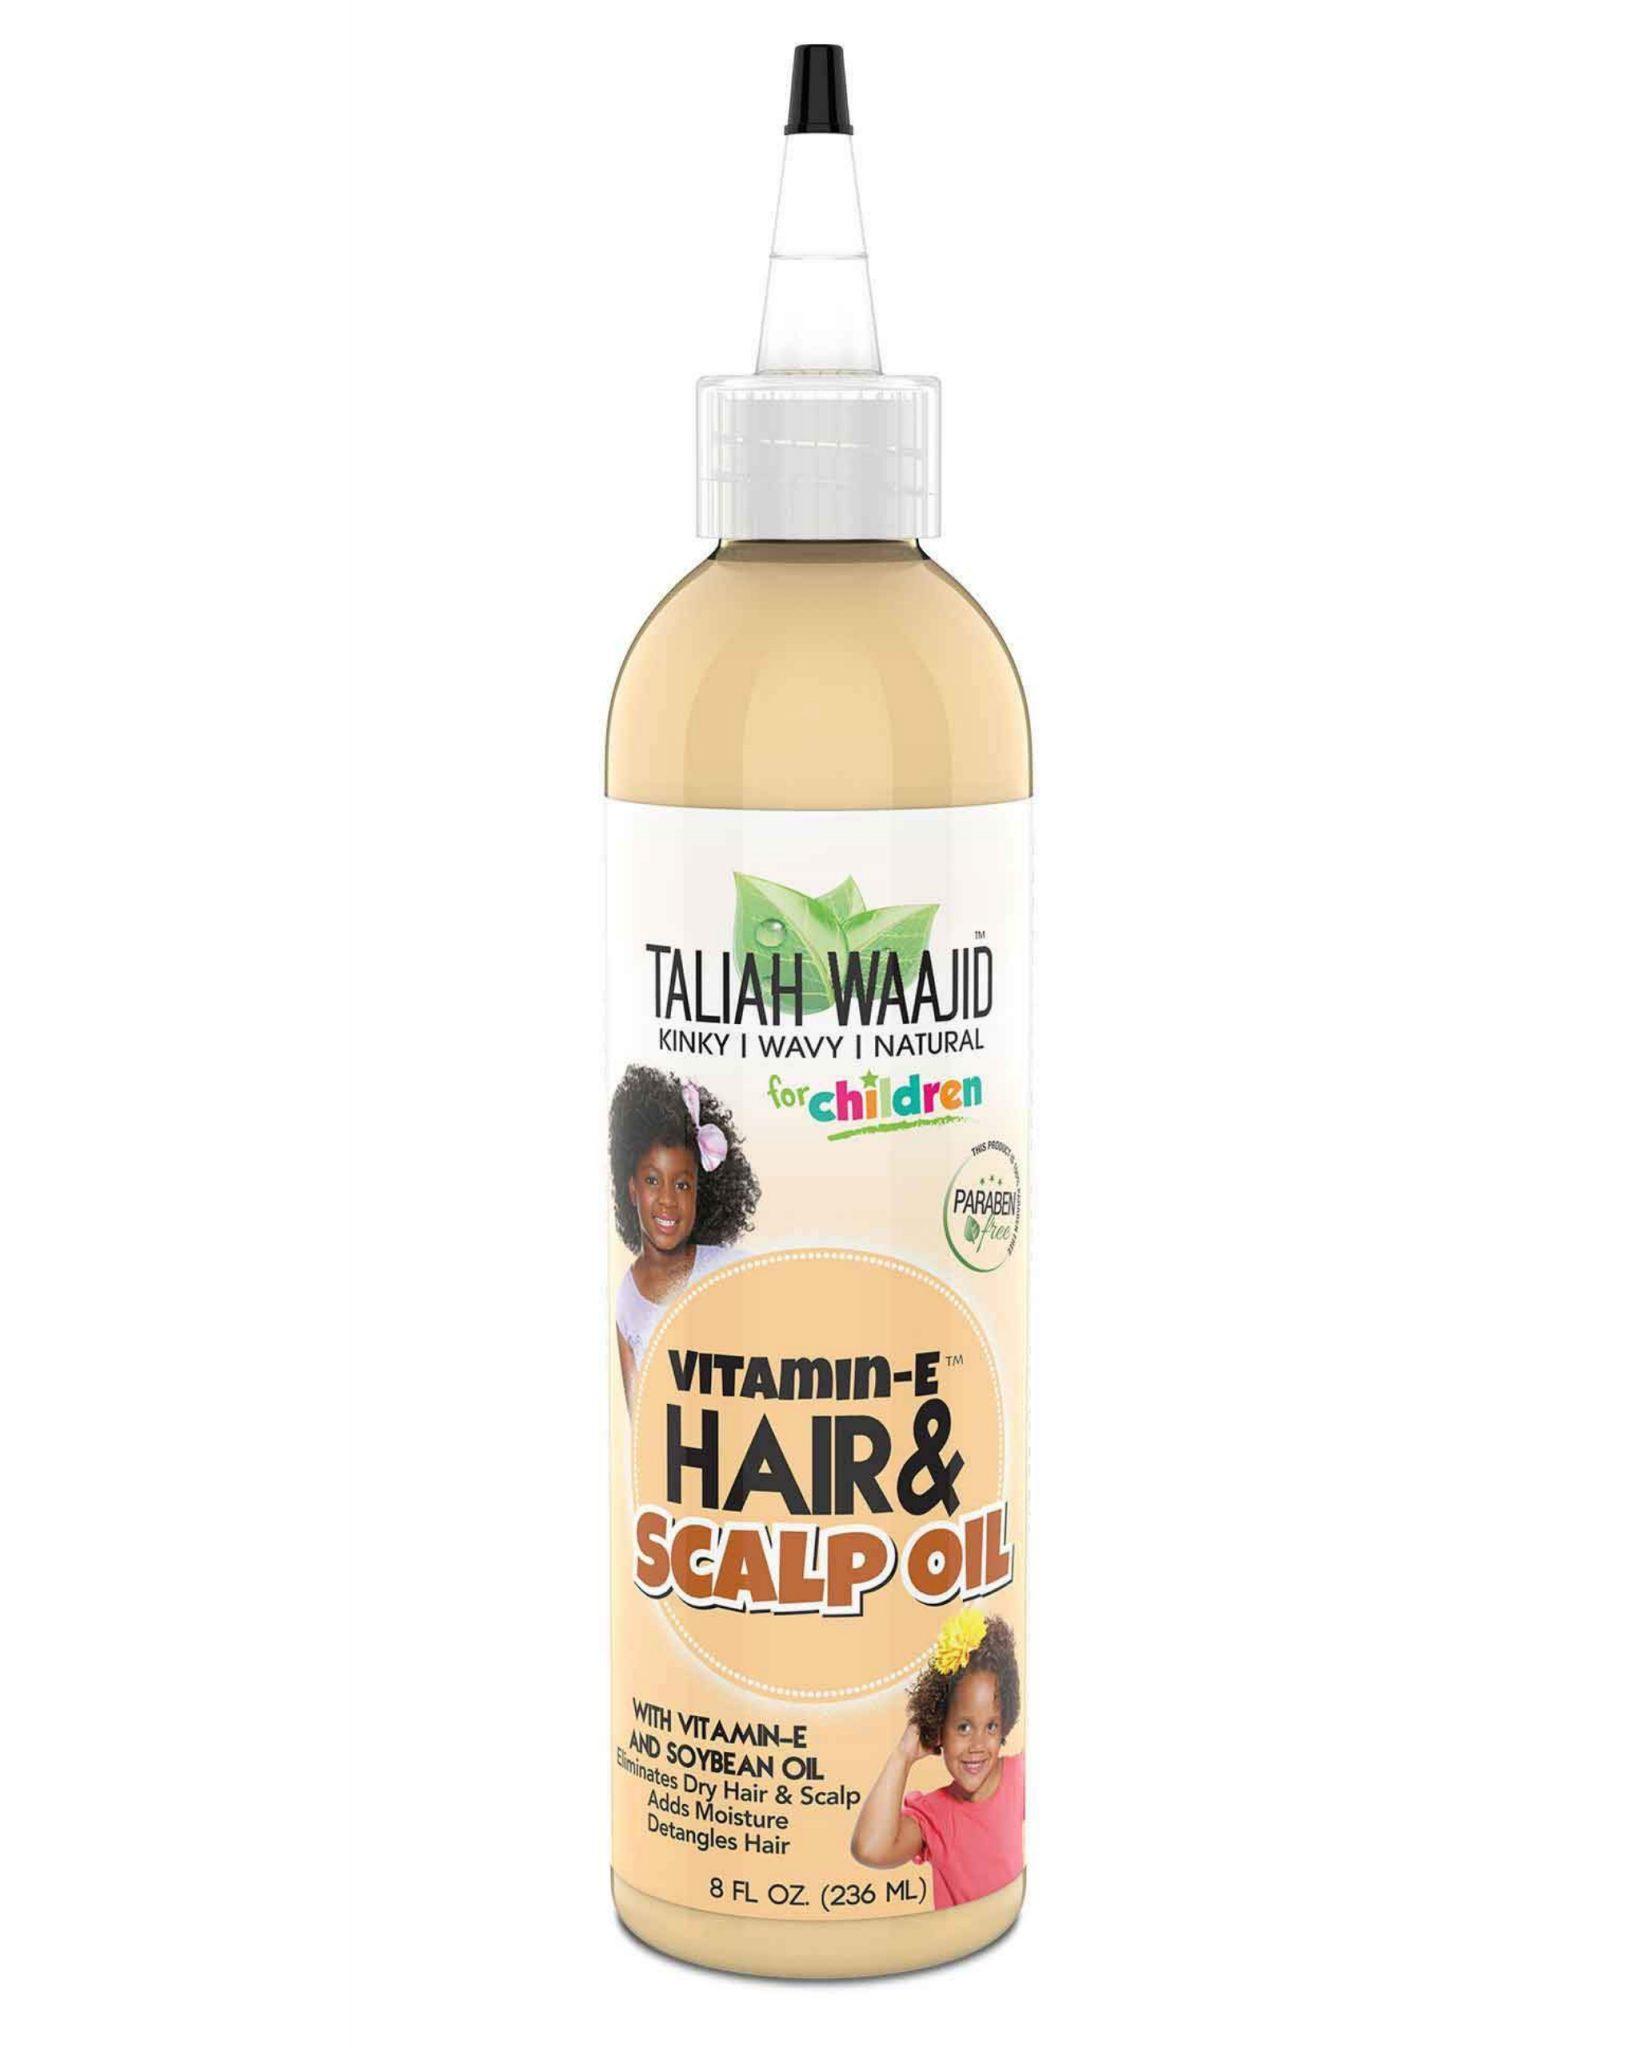 Taliah Waajid for Children Vitamin E Hair & Scalp Oil